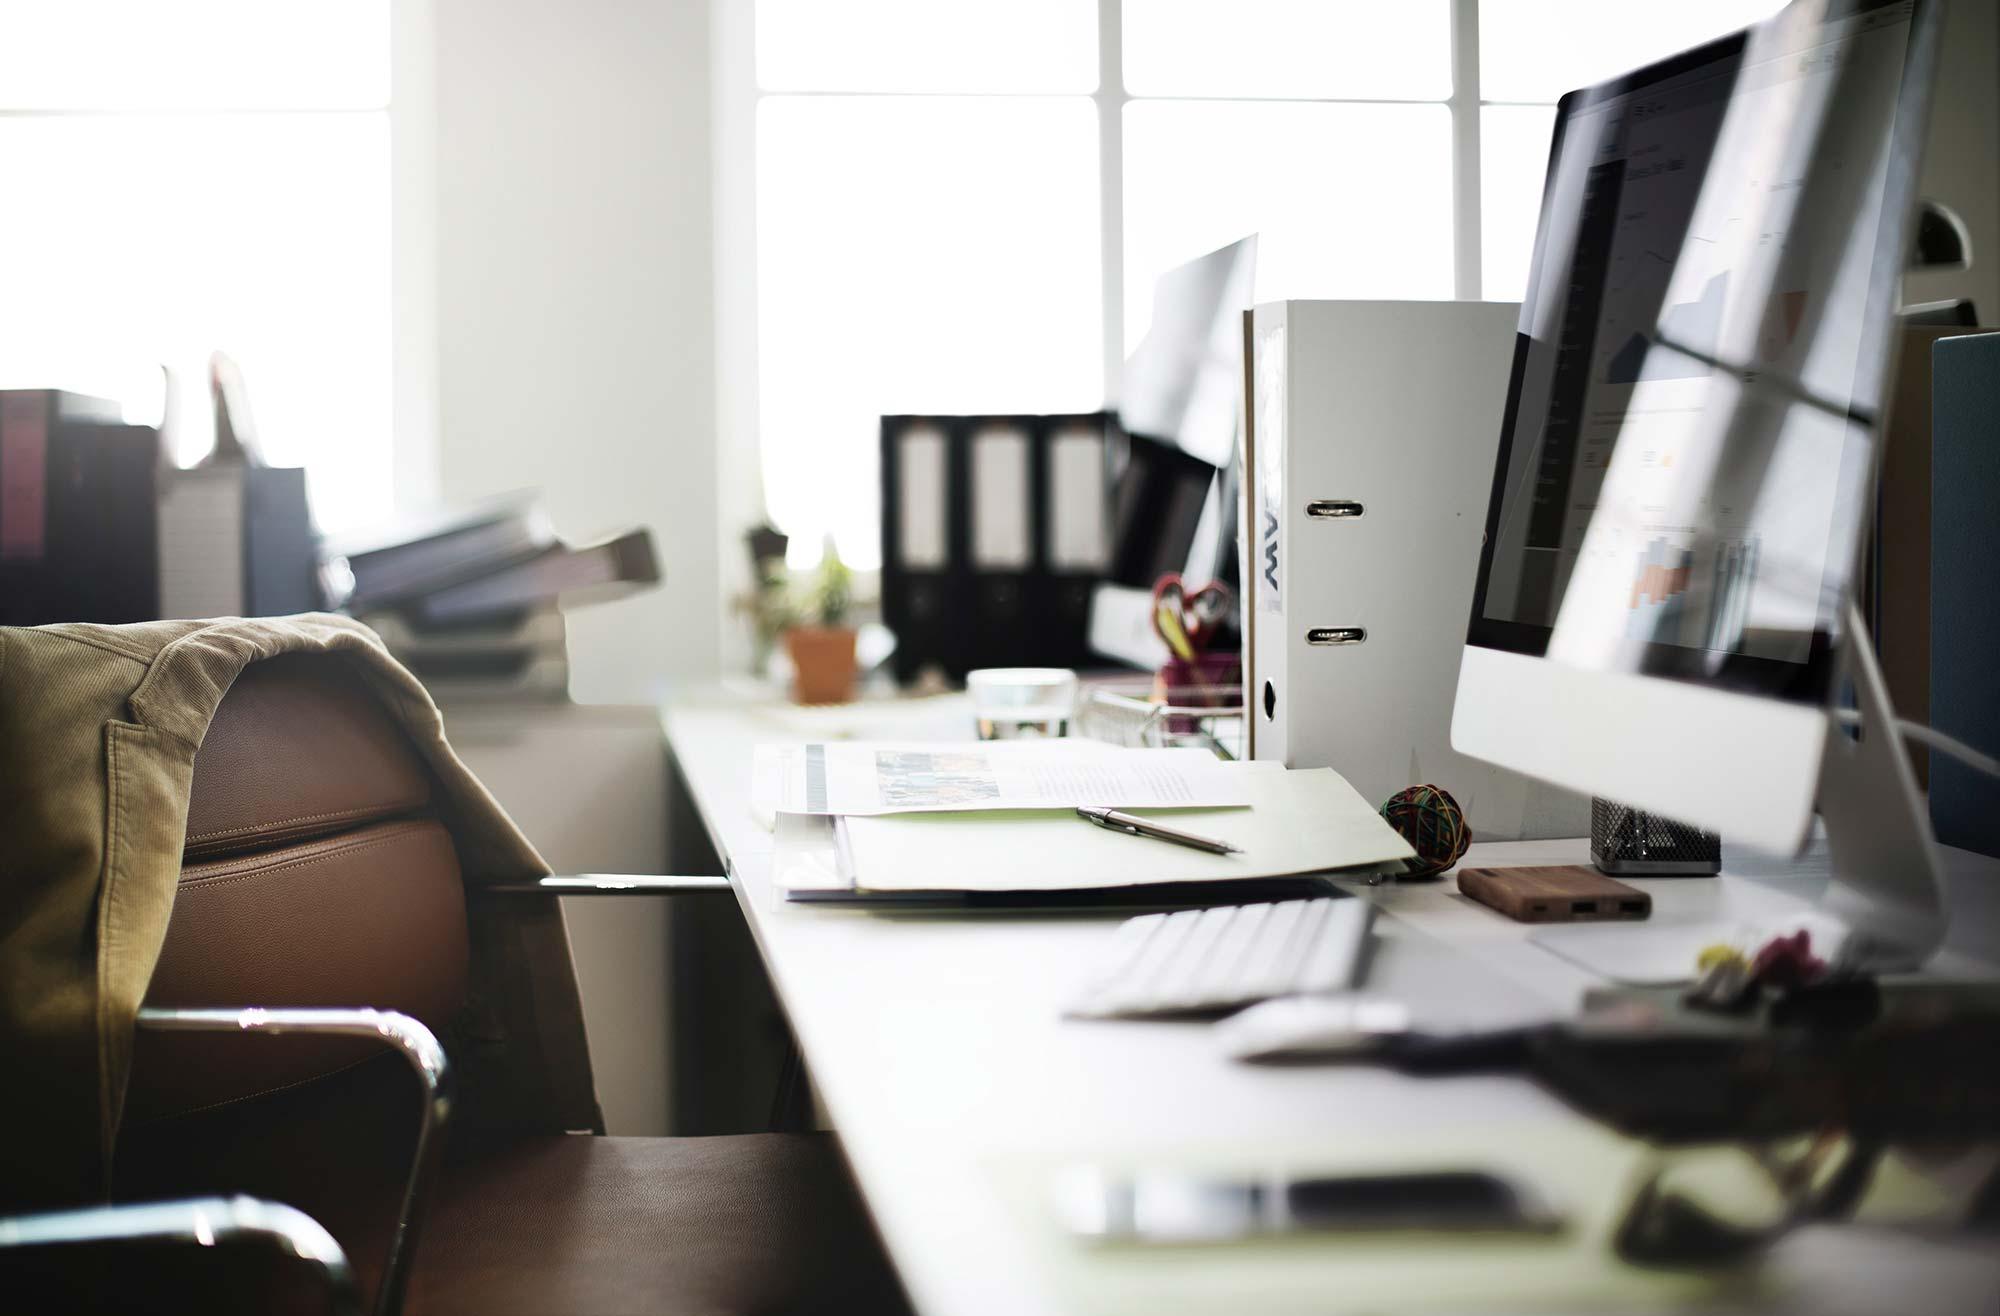 Contract Review Software: Pre-Signature vs. Post-Signature Solutions